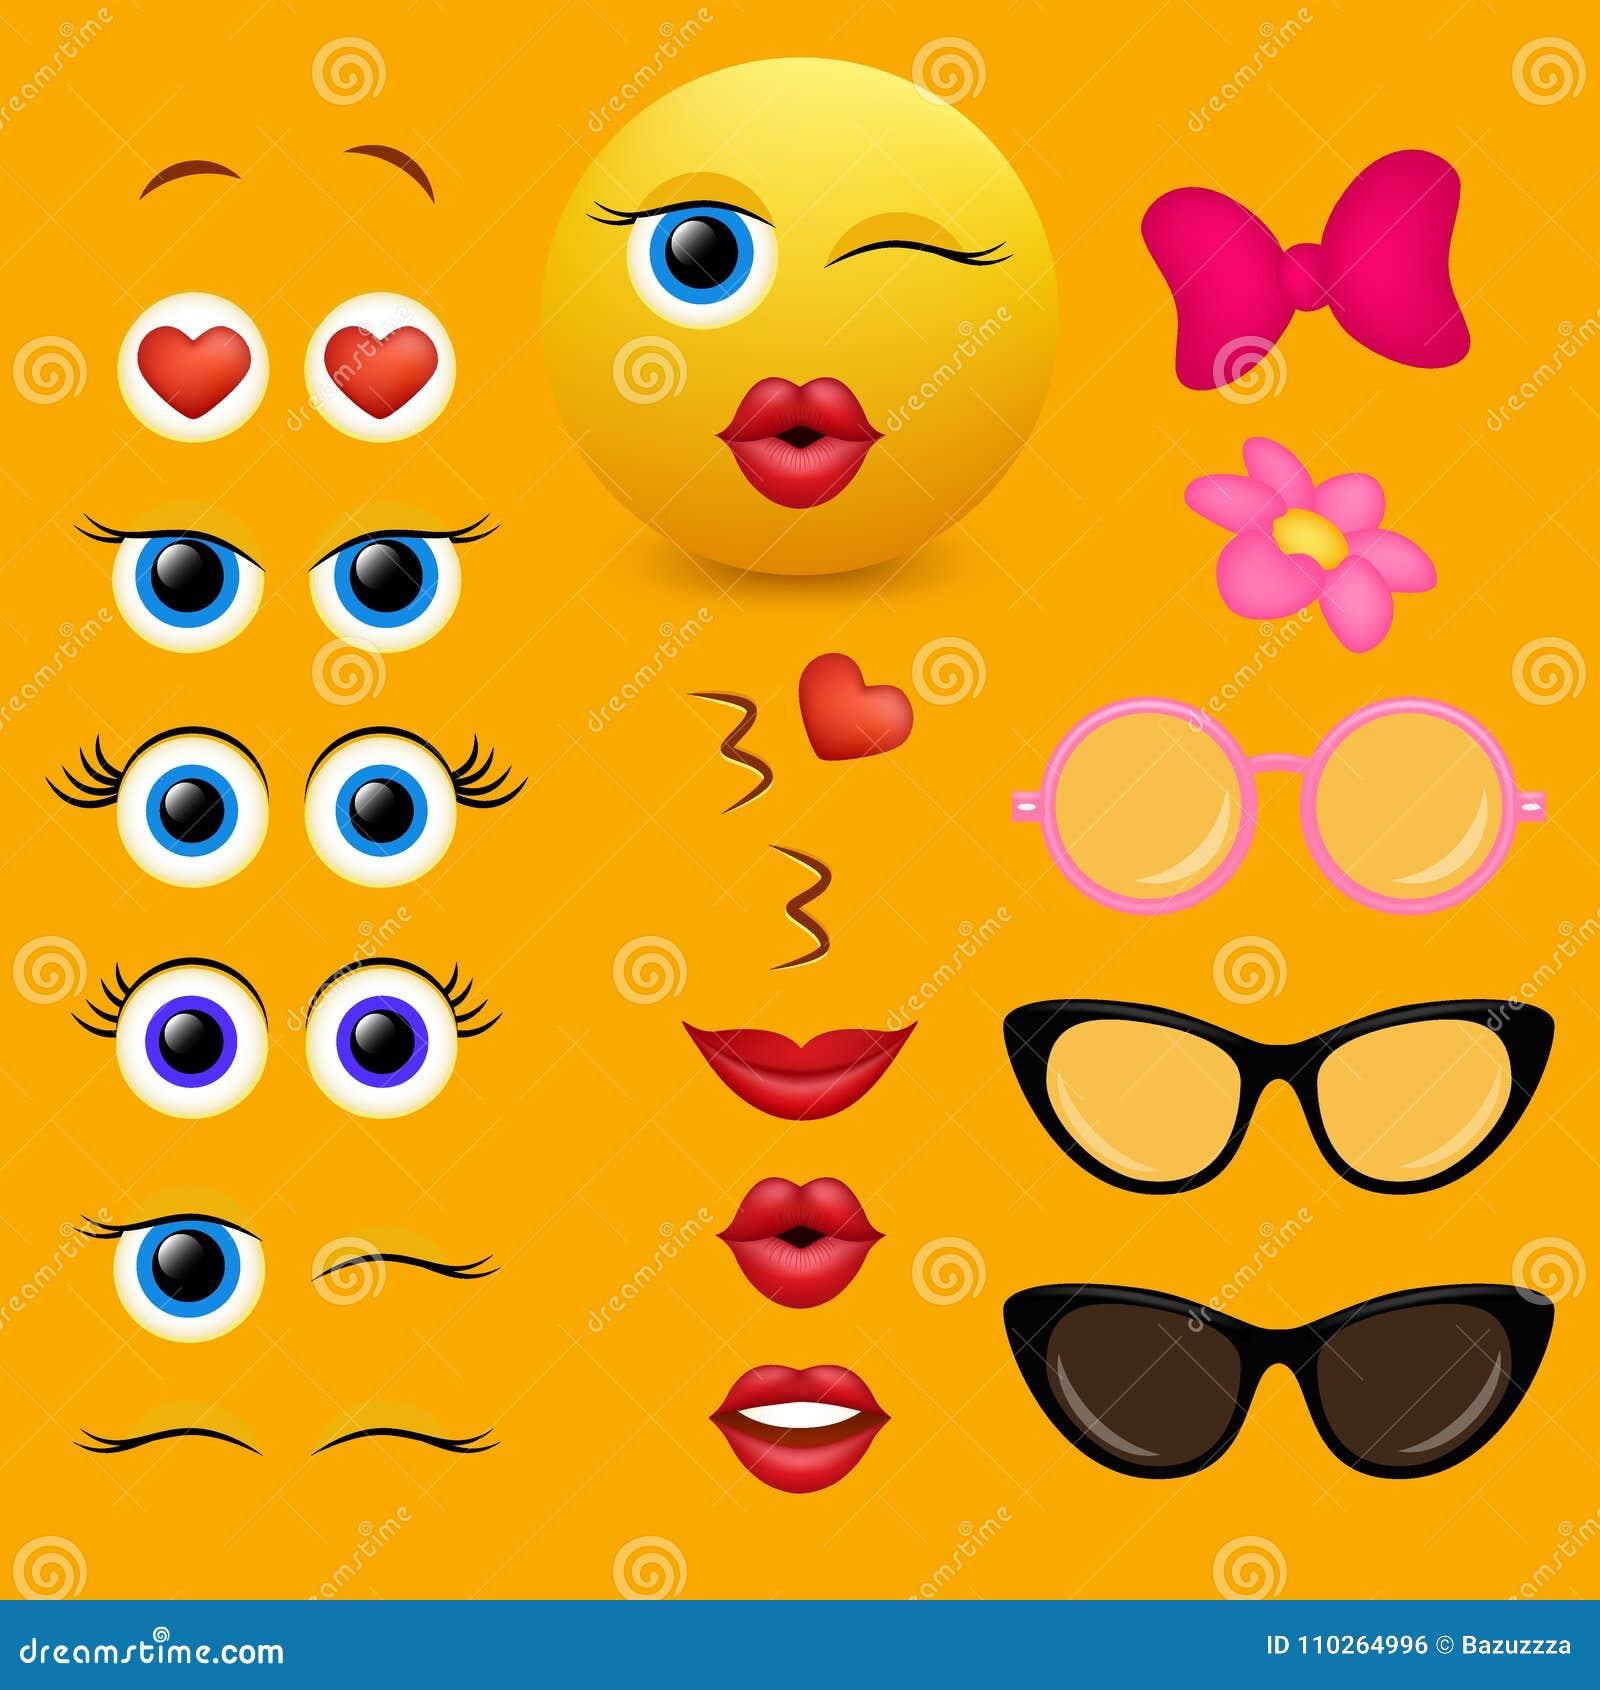 Emoji Creator Vector Design Collection Stock Vector